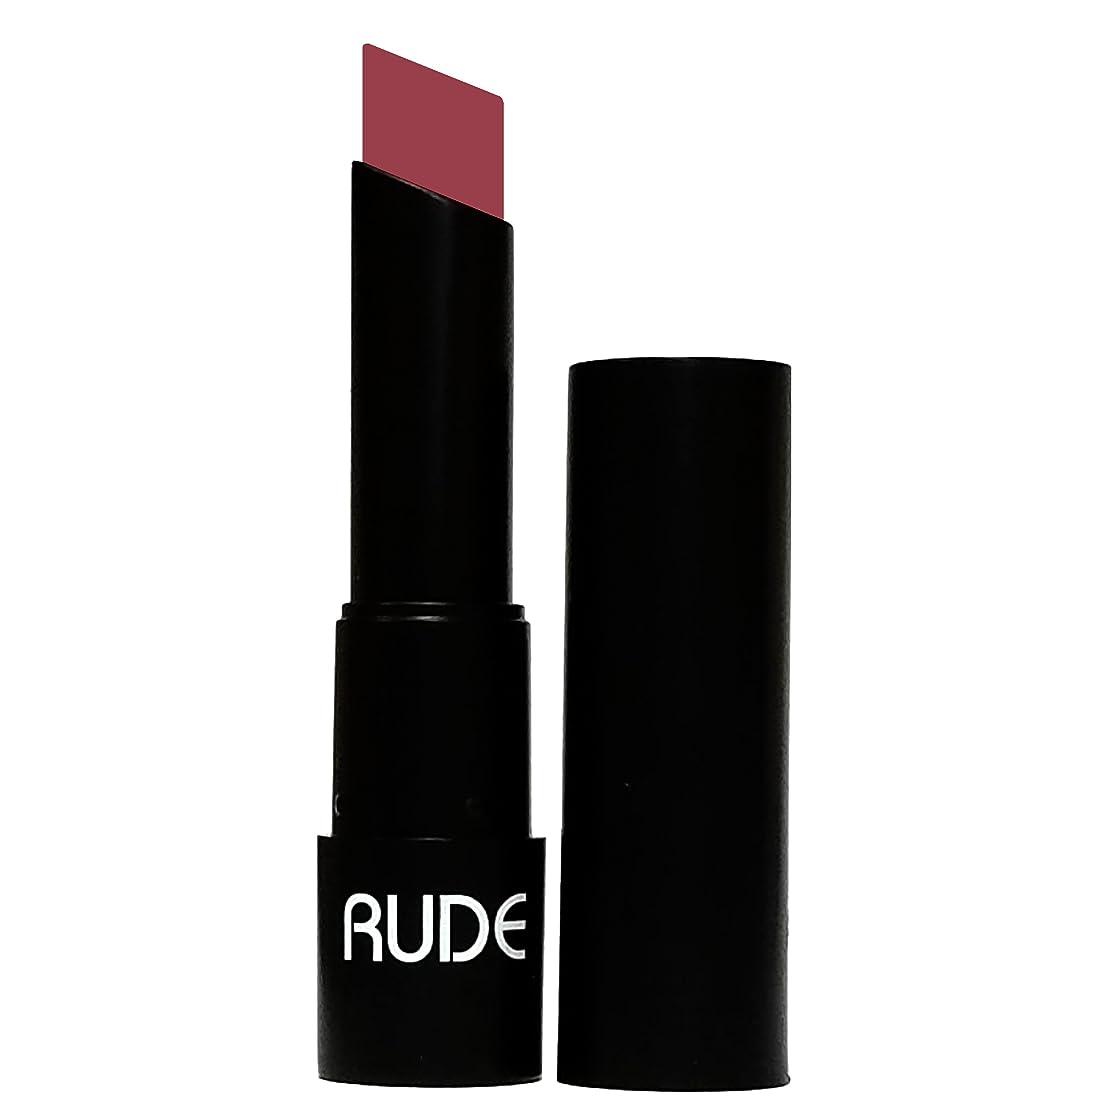 哺乳類専門知識特異な(6 Pack) RUDE Attitude Matte Lipstick - Rowdy (並行輸入品)